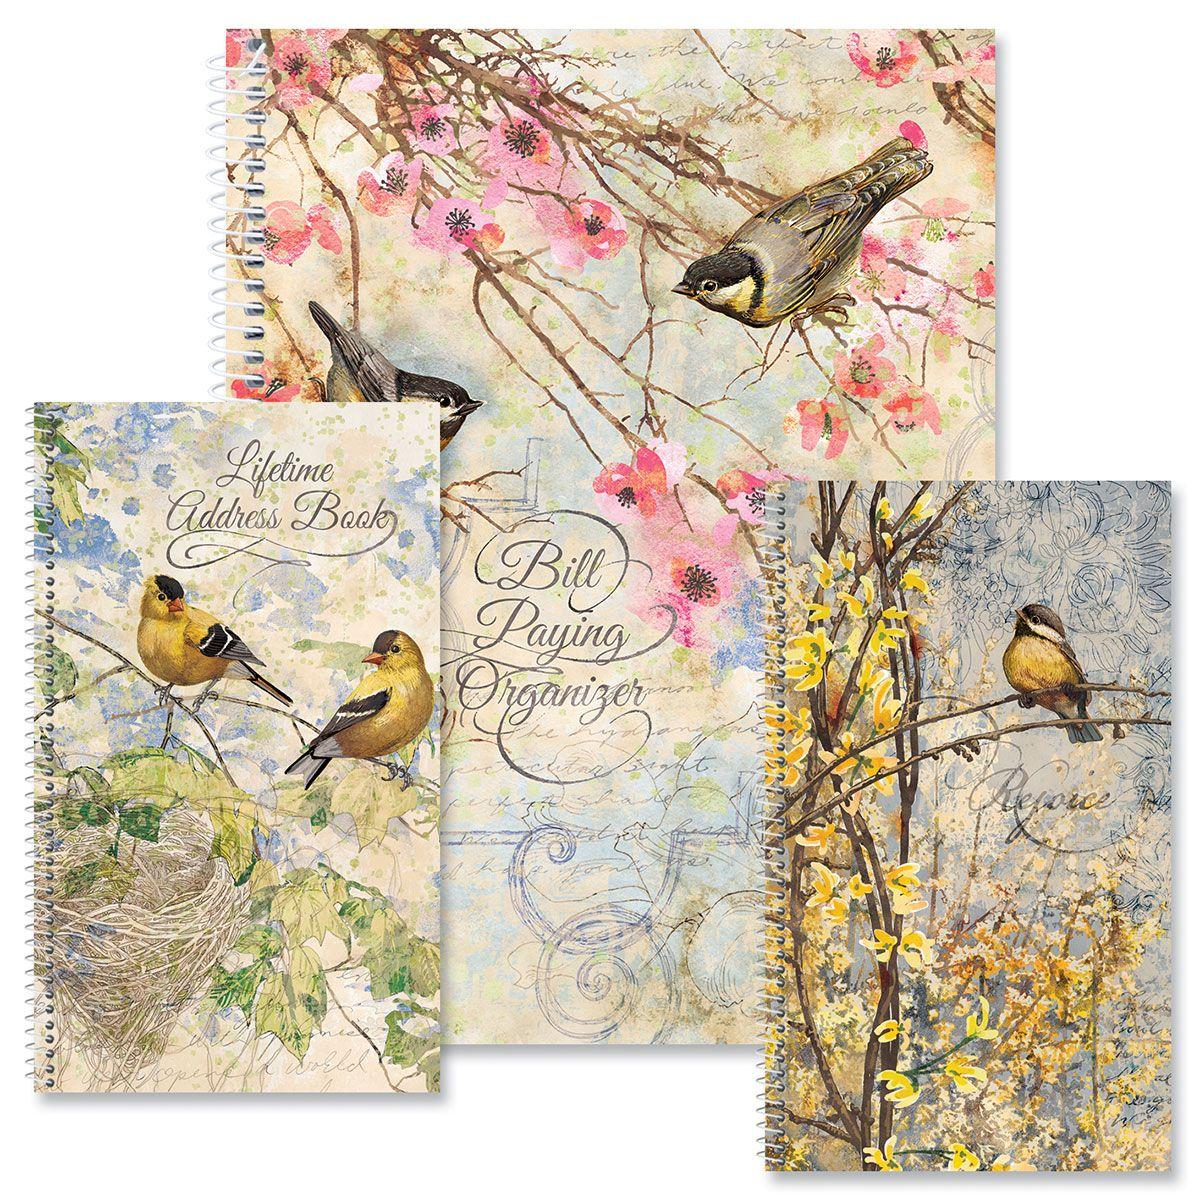 Feathered Nest Organizer Books